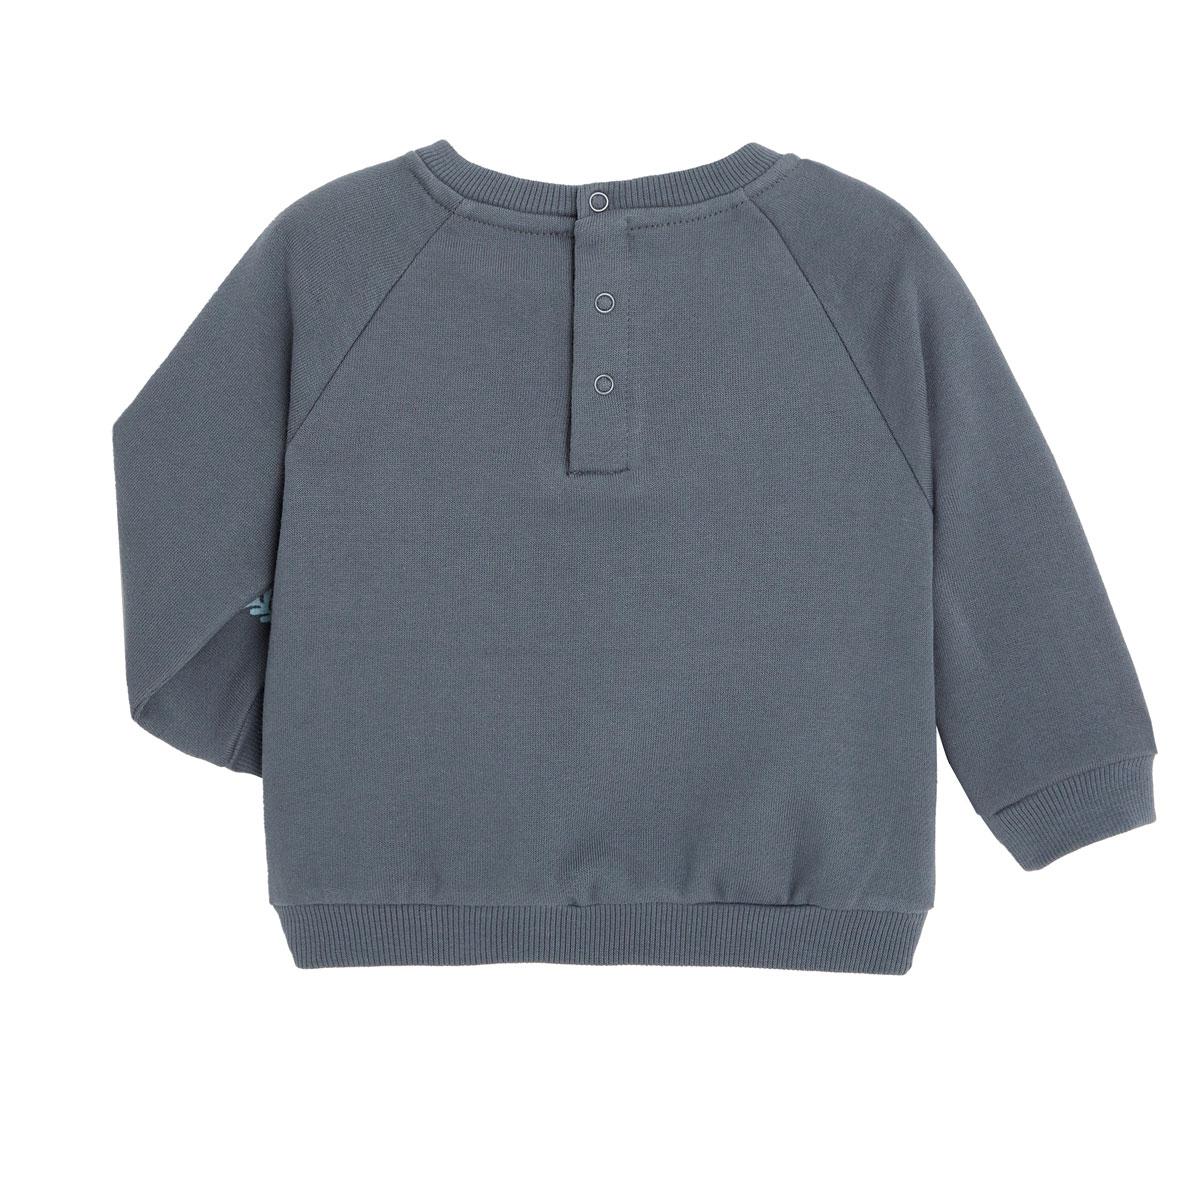 Sweat-shirt garçon contenant du coton gratté bio Aloha Havana dos